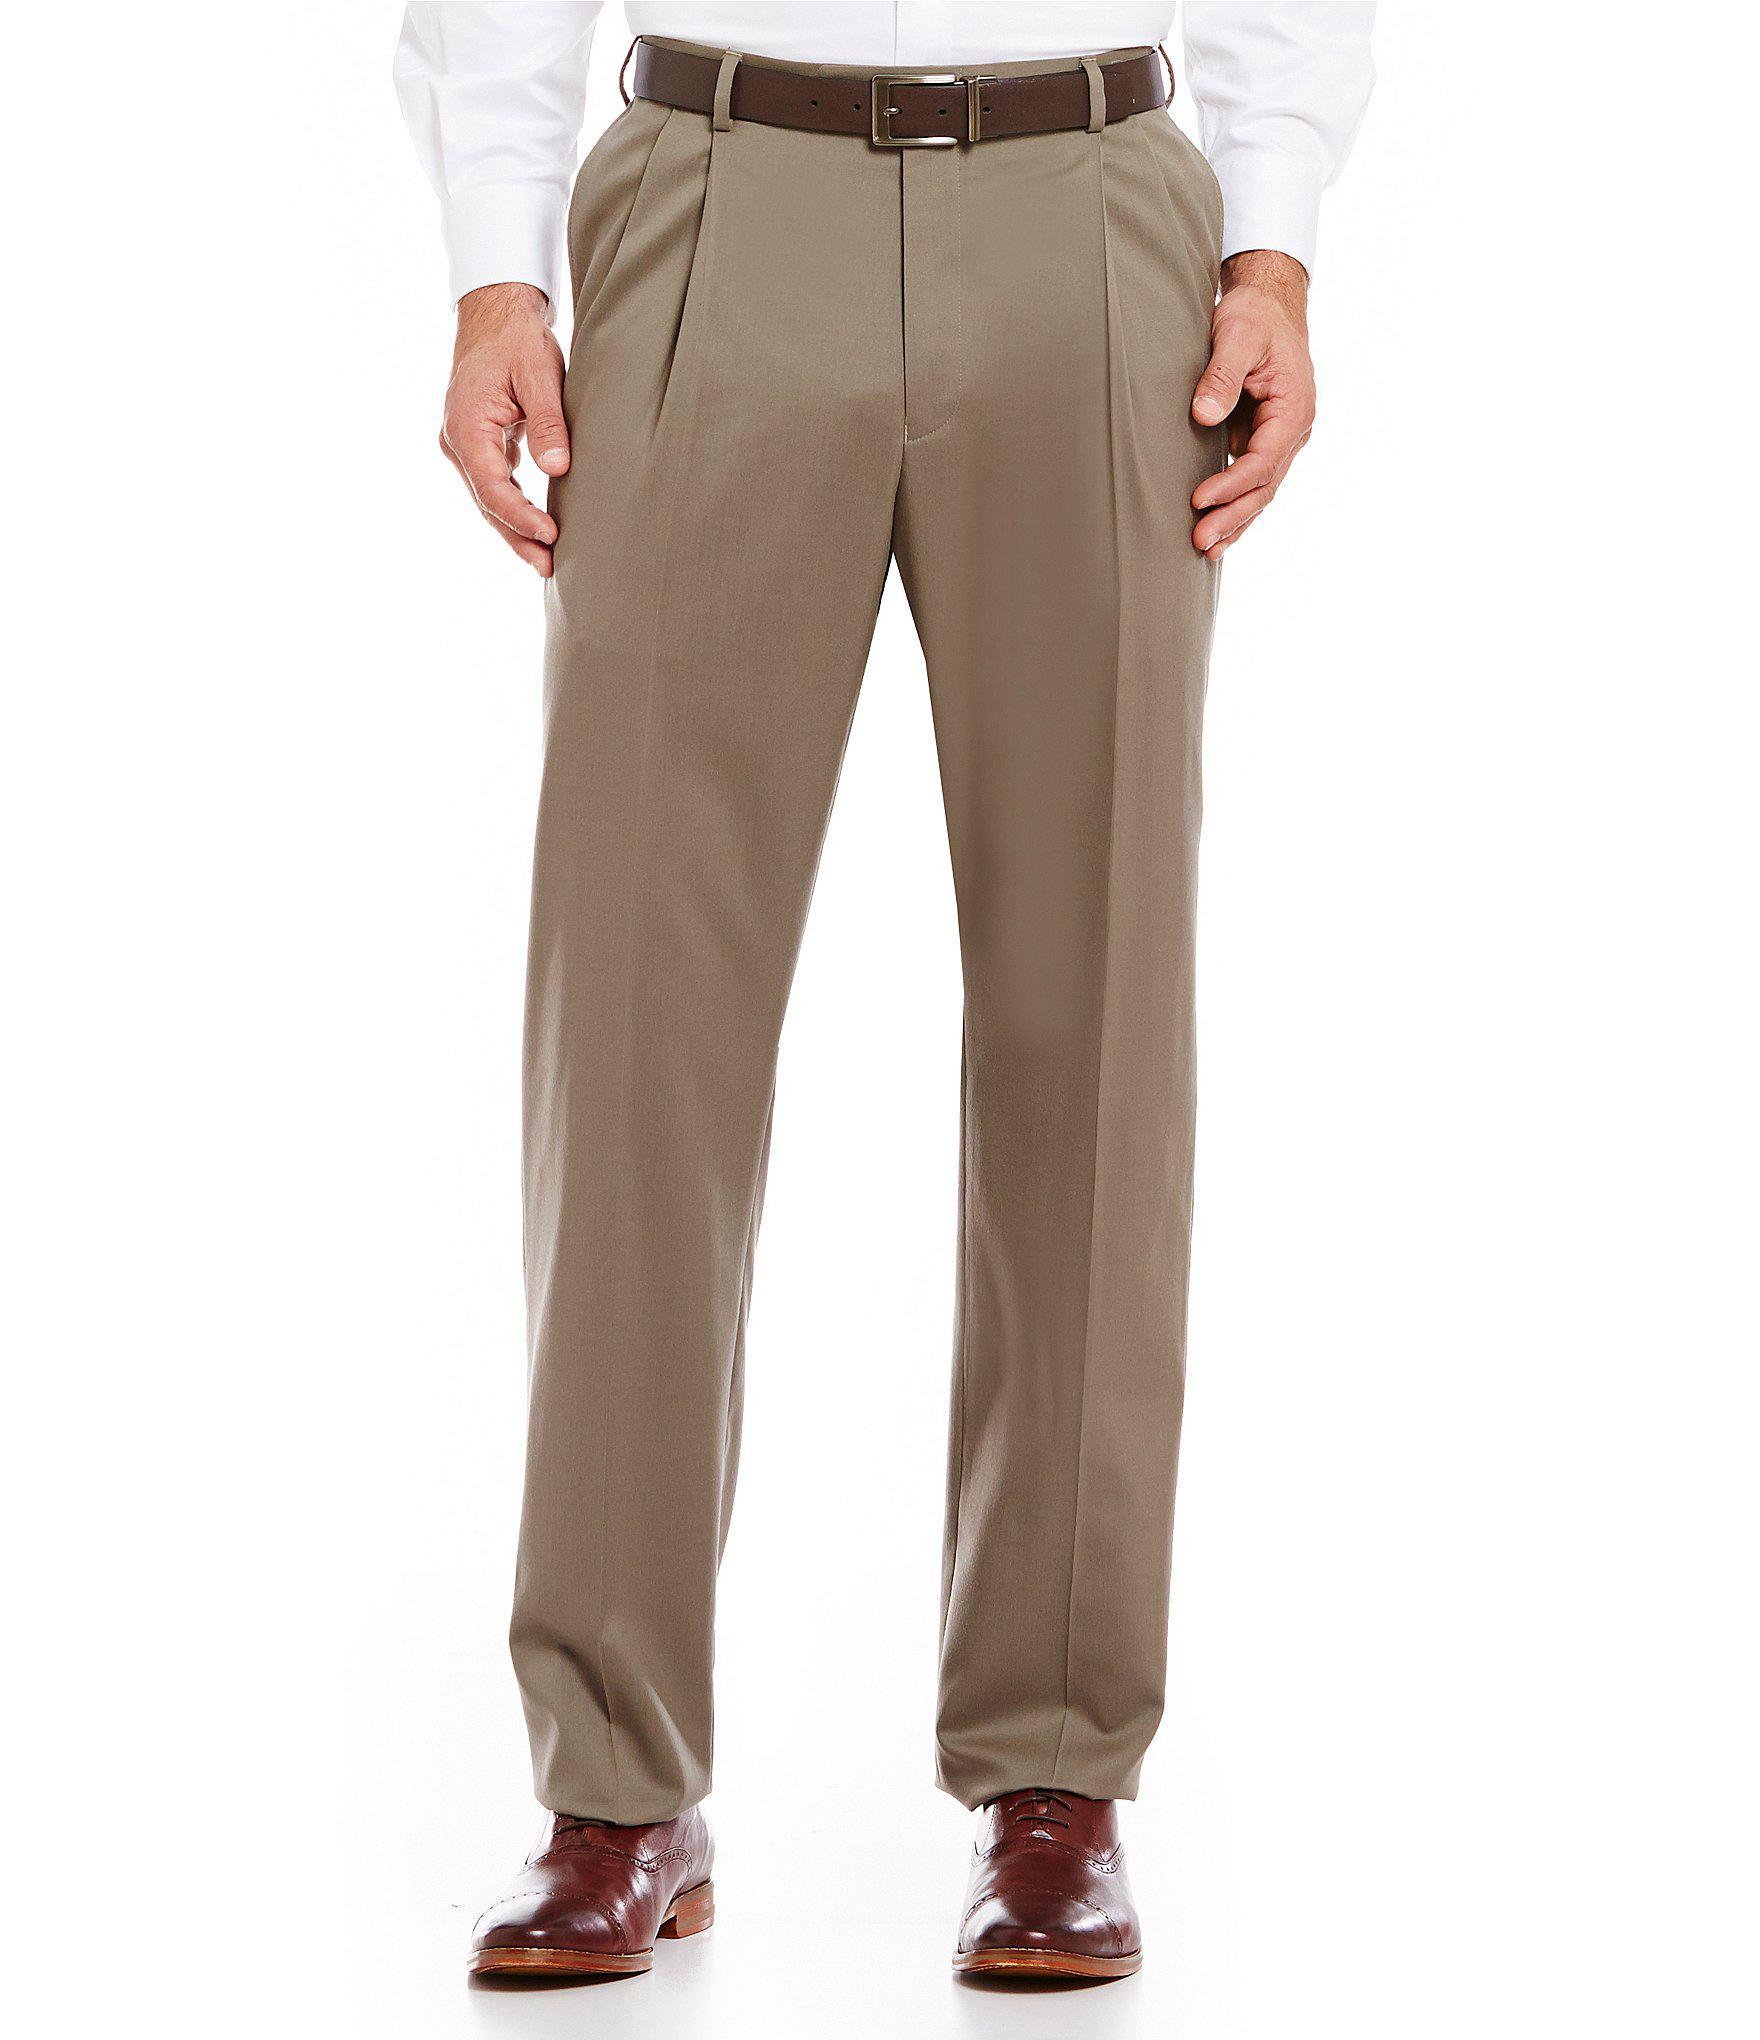 Men/'s Big and Tall BLACK Dress Pants John Bartlett PLEATED SLACKS